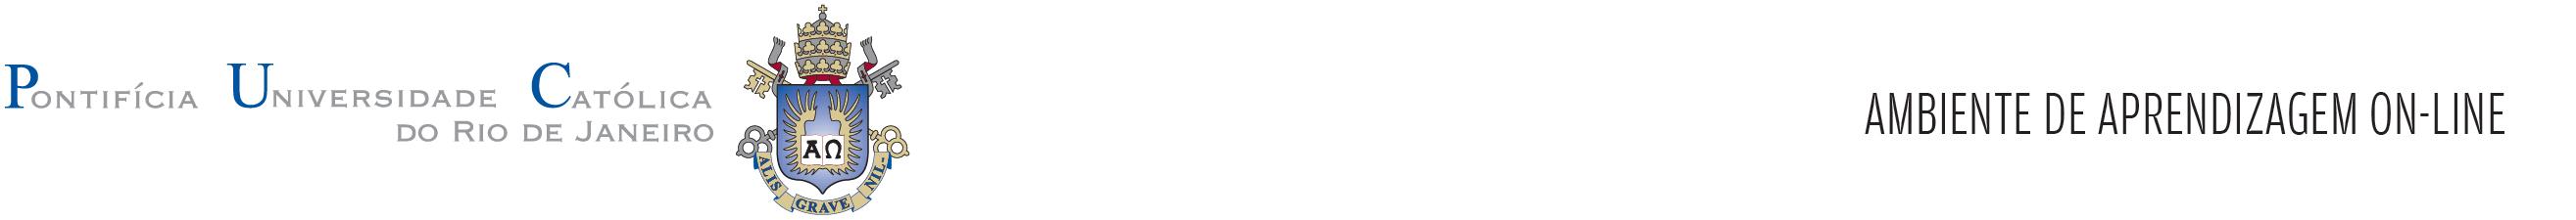 [ Home ] CCEAD PUC-Rio Logotipo